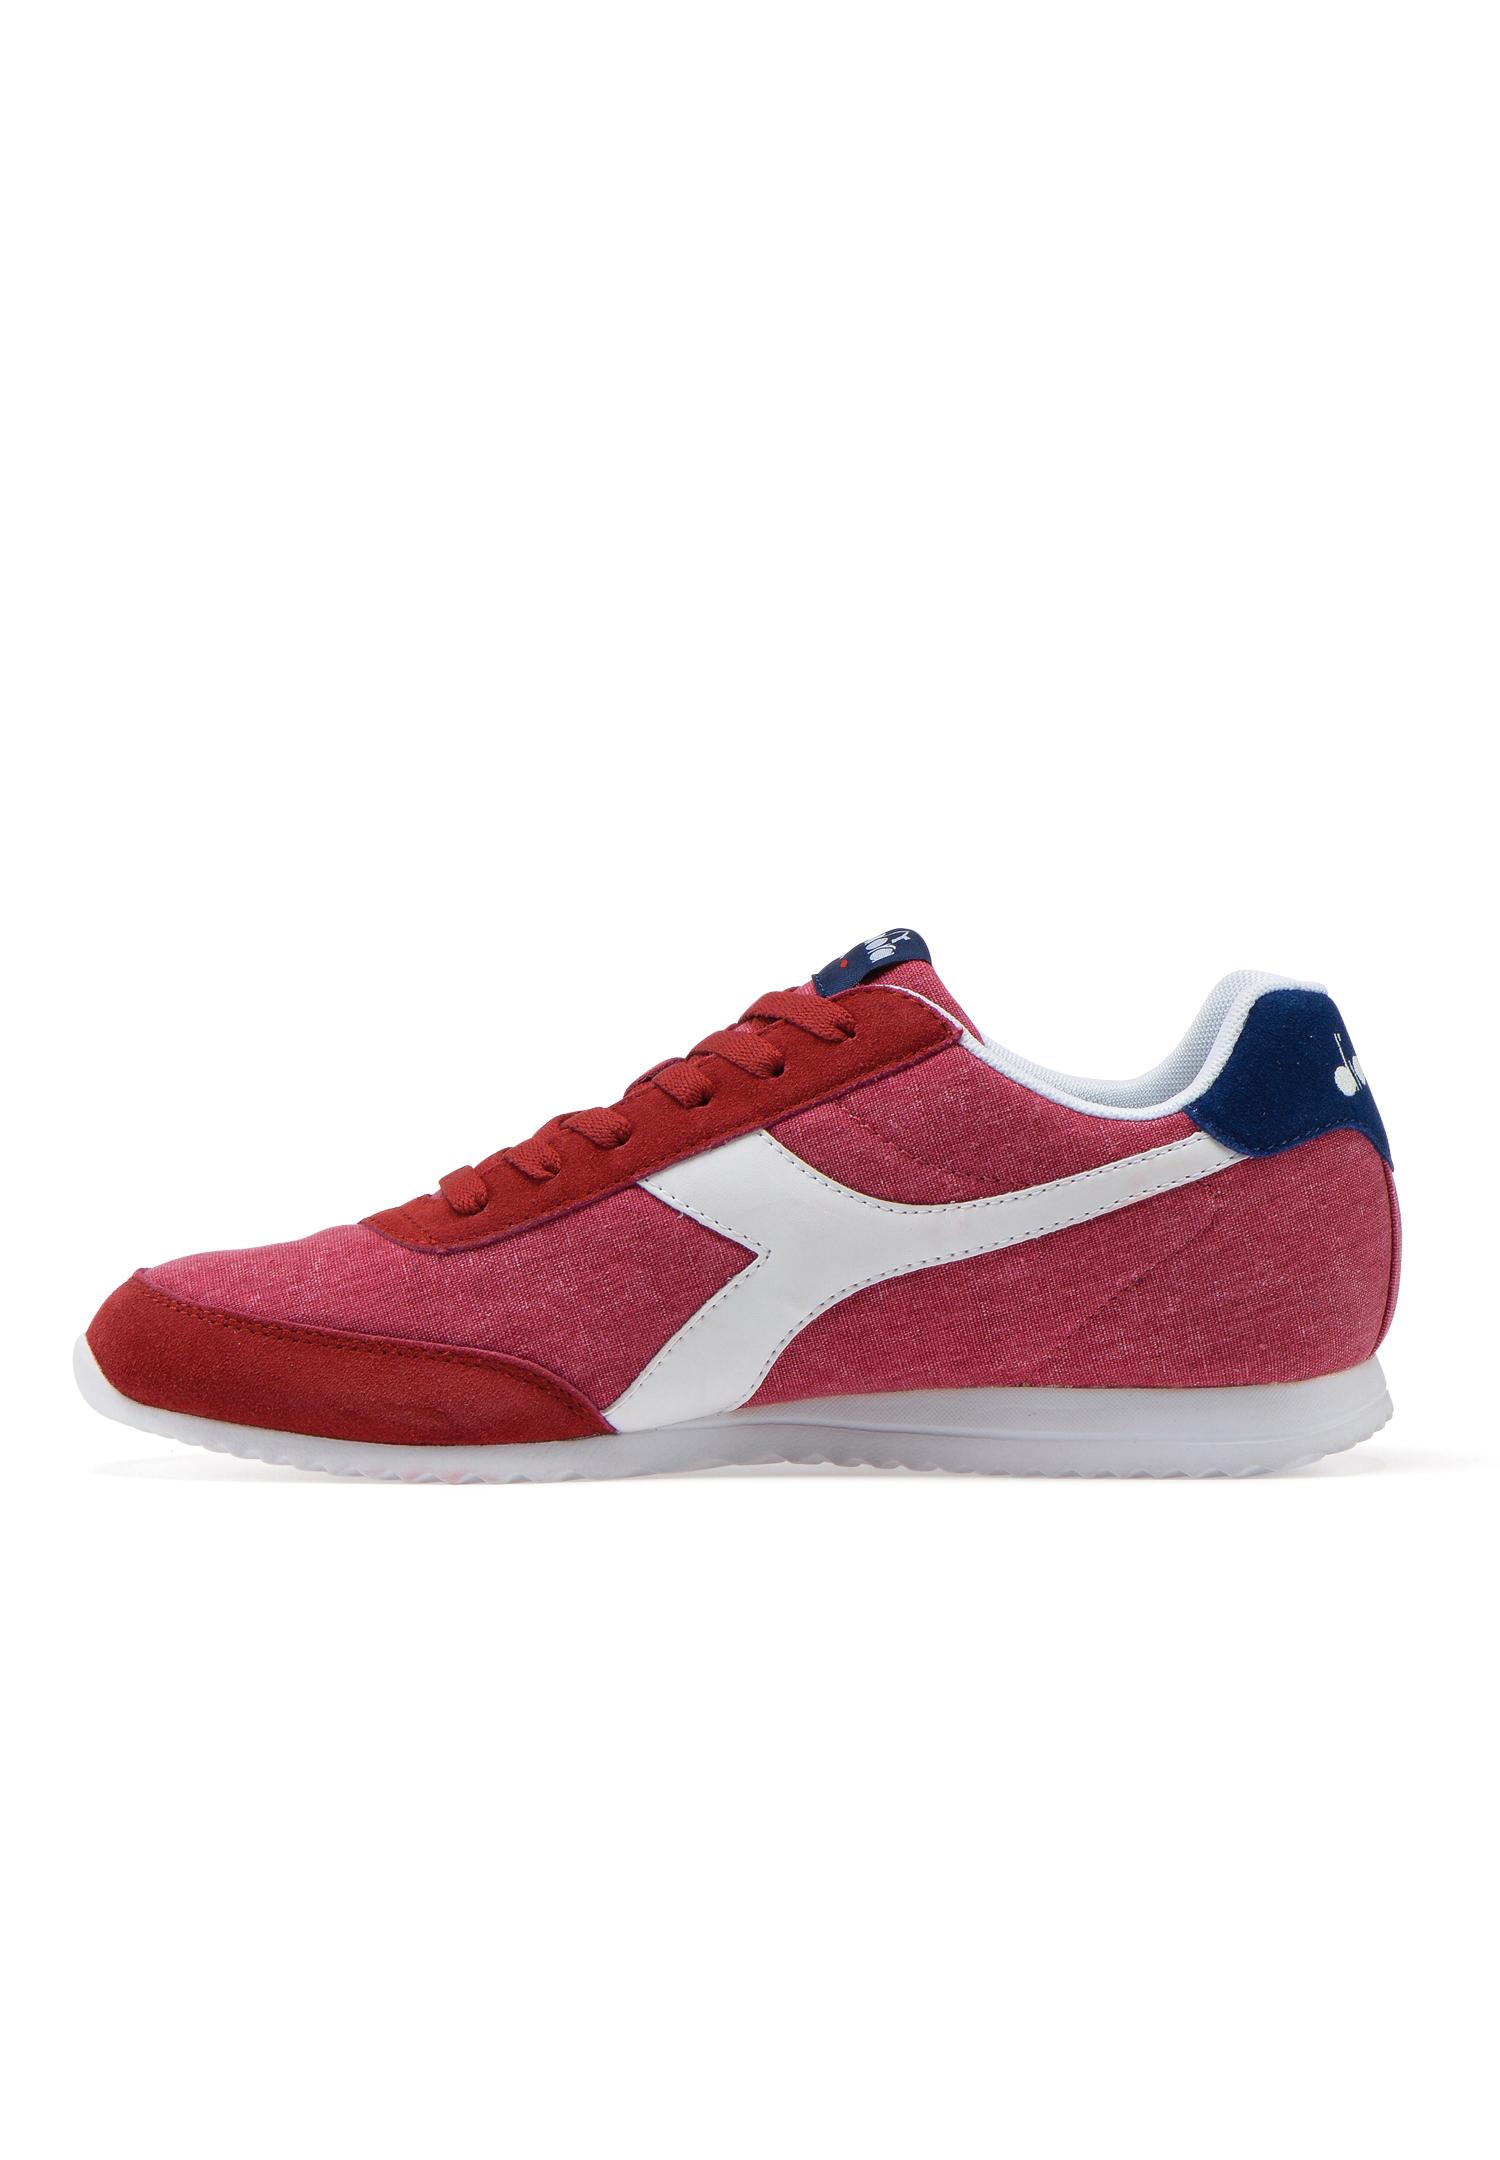 Scarpe-Diadora-Jog-Light-C-Sneakers-sportive-uomo-donna-vari-colori-e-taglie miniatura 9